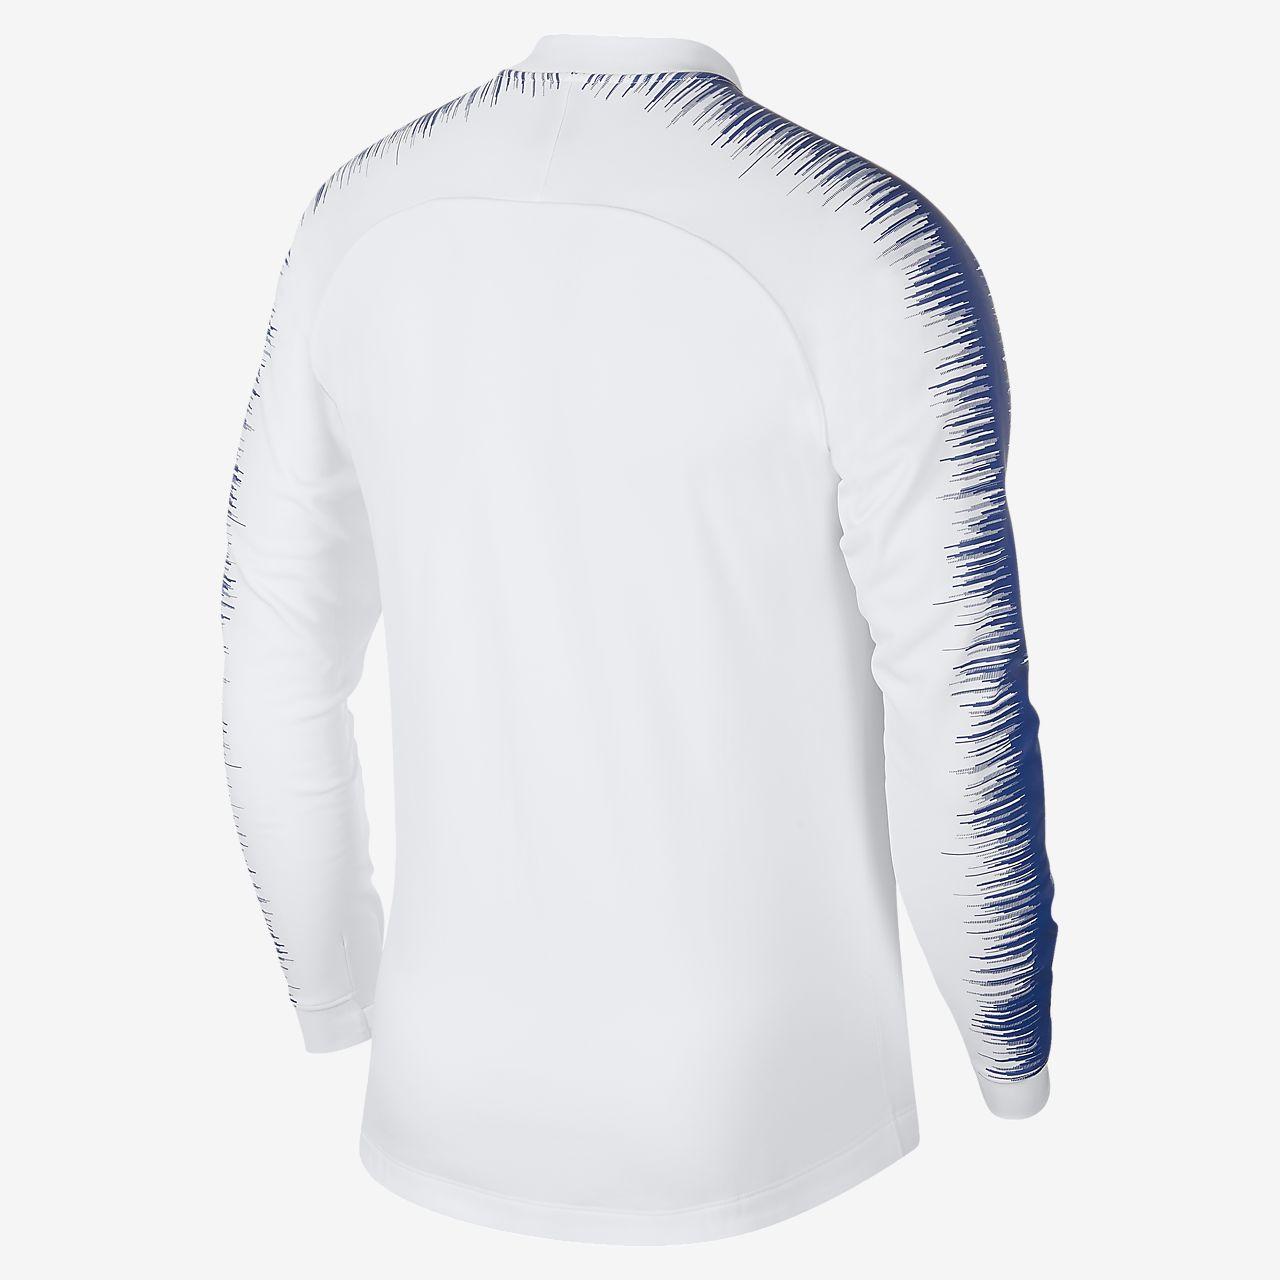 c86799272f2 Chelsea Hoodies Sweatshirts   Kuenzi Turf & Nursery